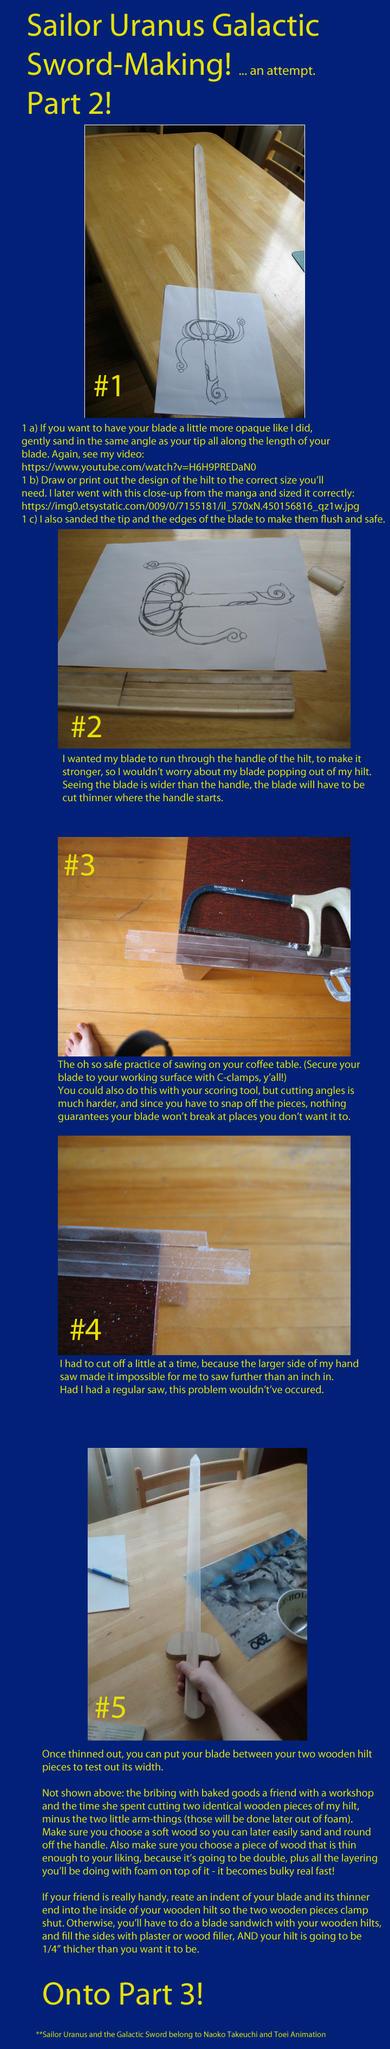 how to make sailor uranus sword